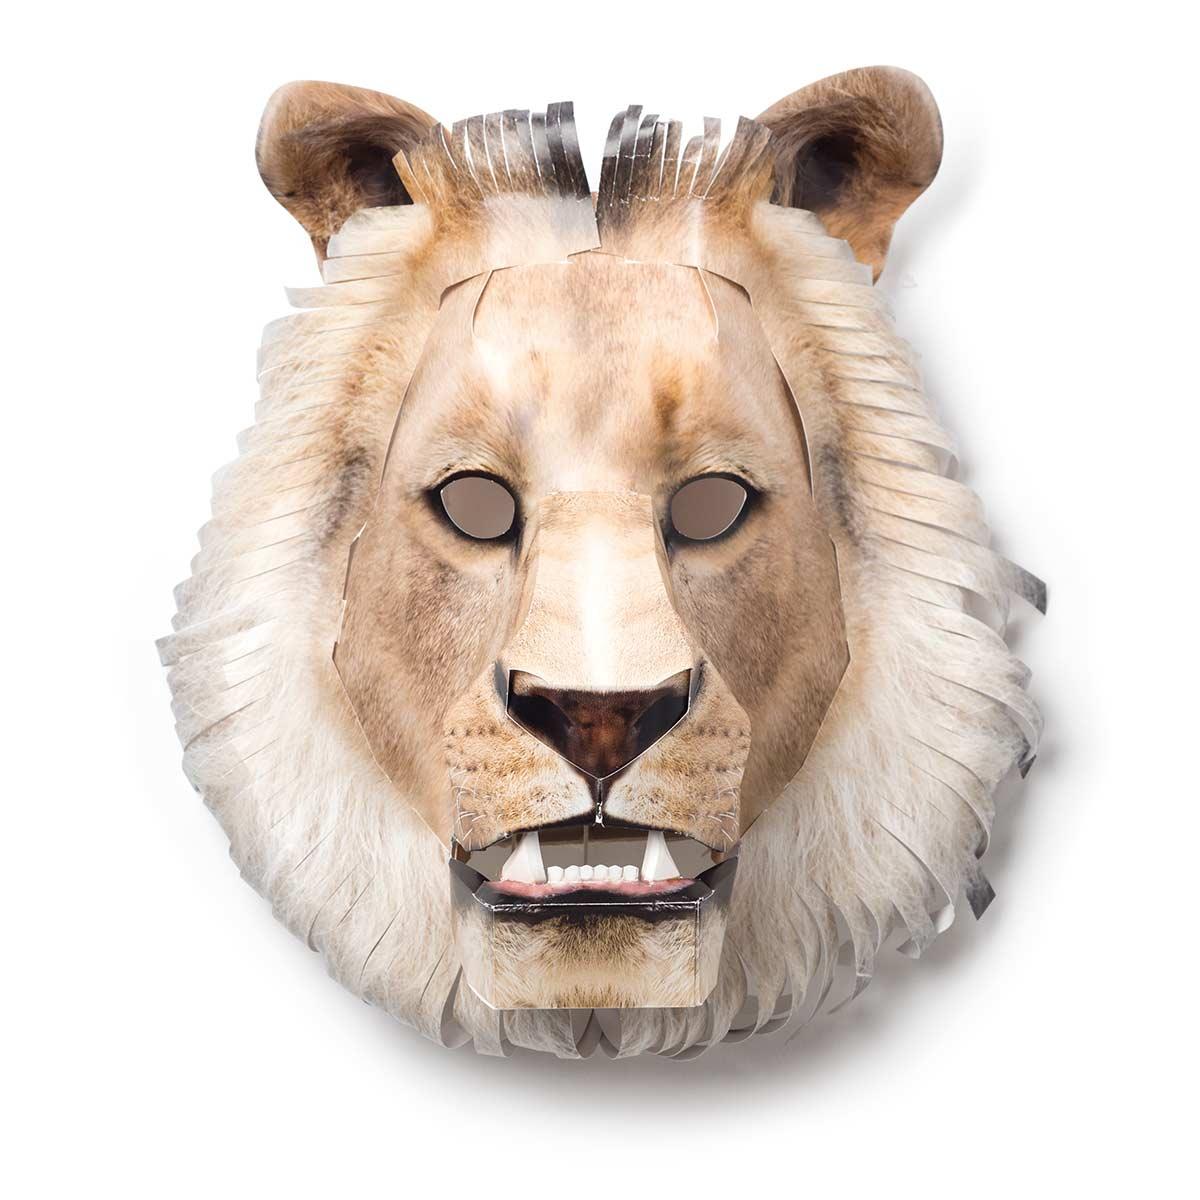 ....Maske Afrikanischer Löwe .. African lion mask ....